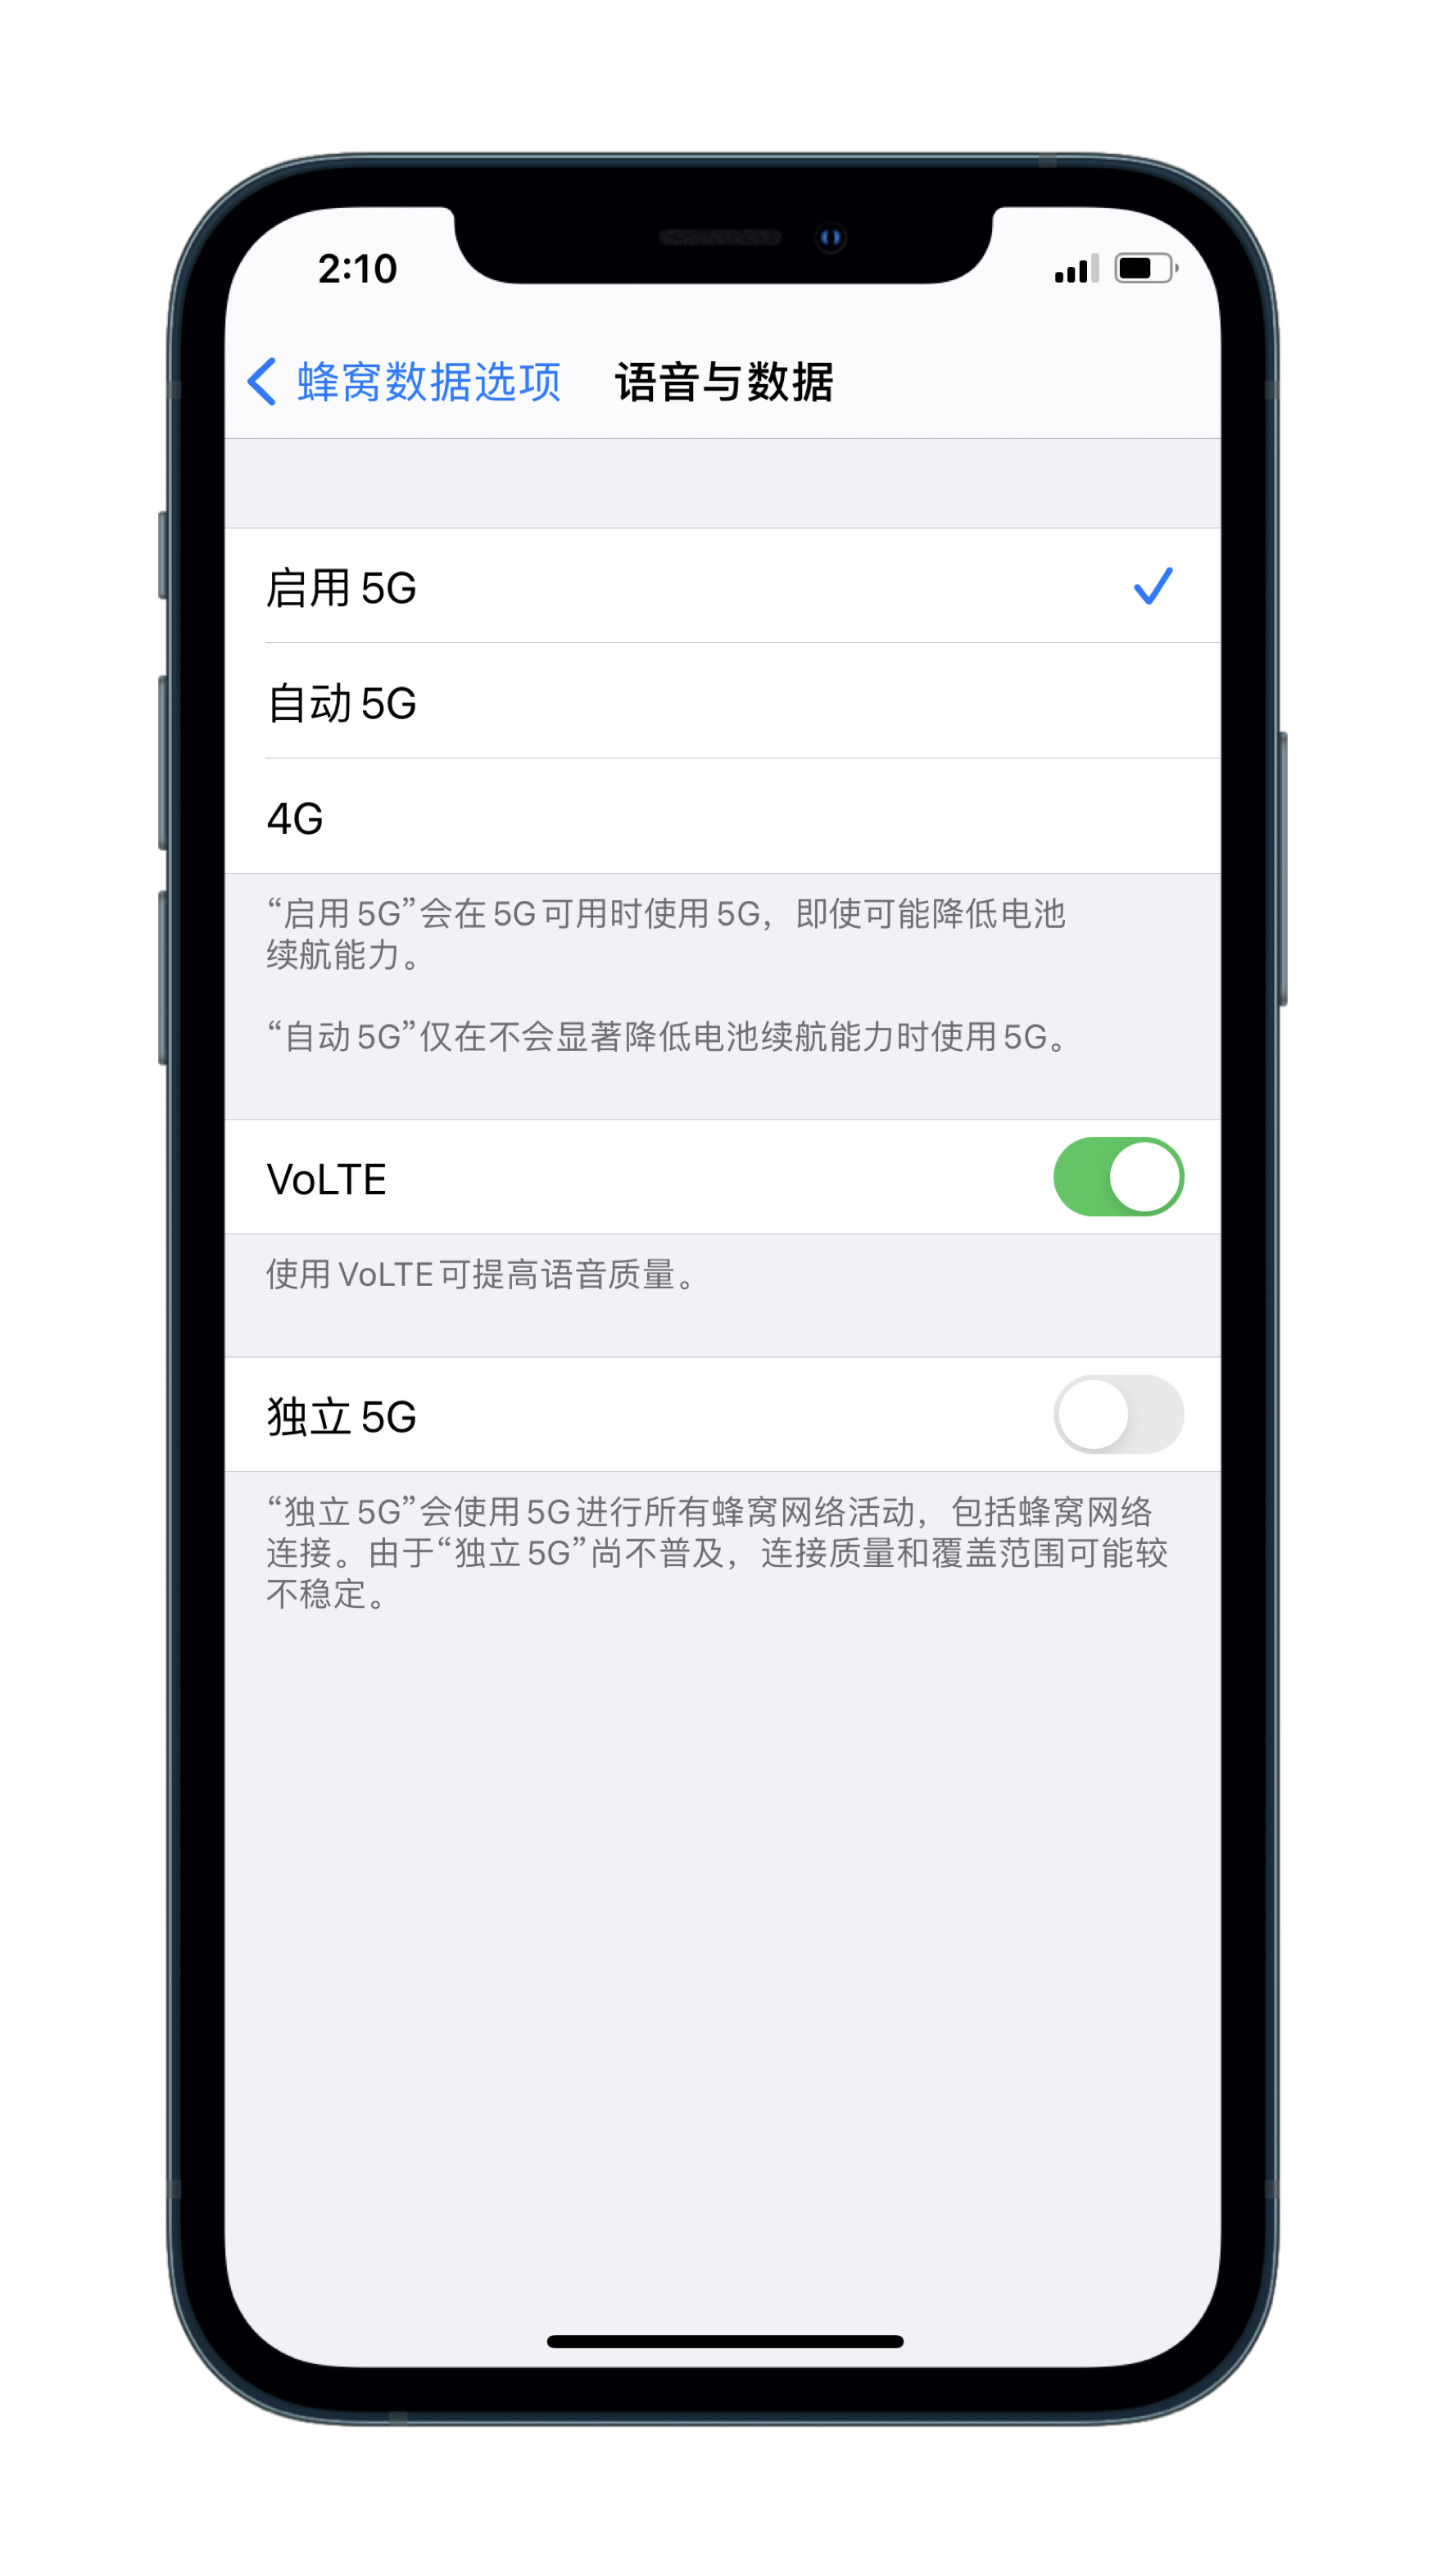 iPhone 12会支持使用手机数据下载iOS更新吗?